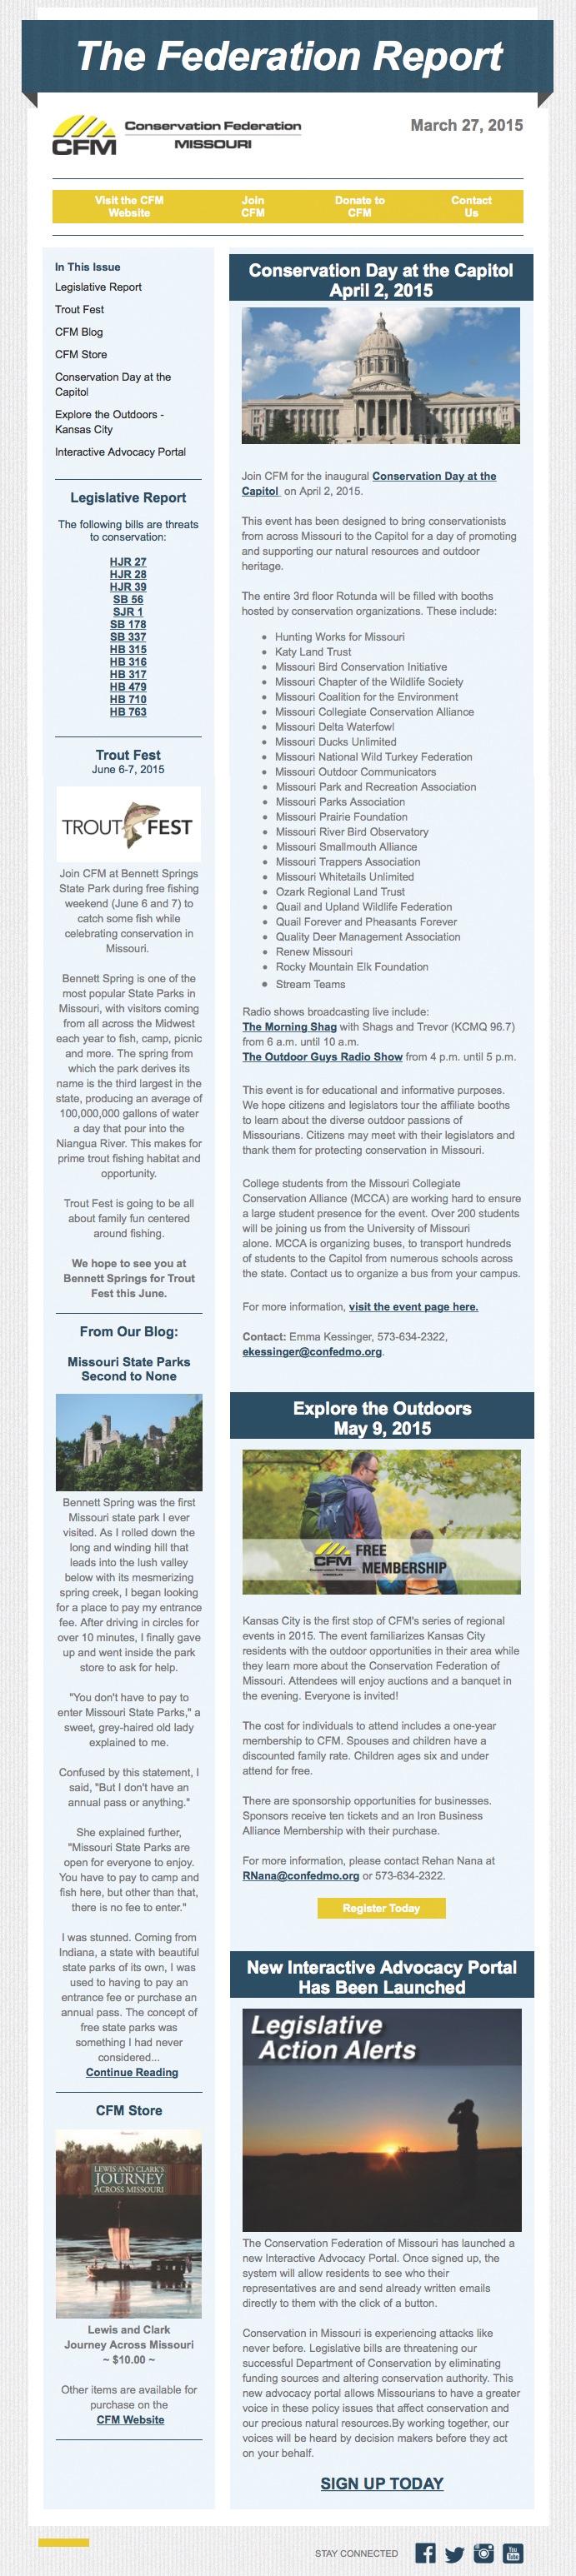 March 27 Newsletter